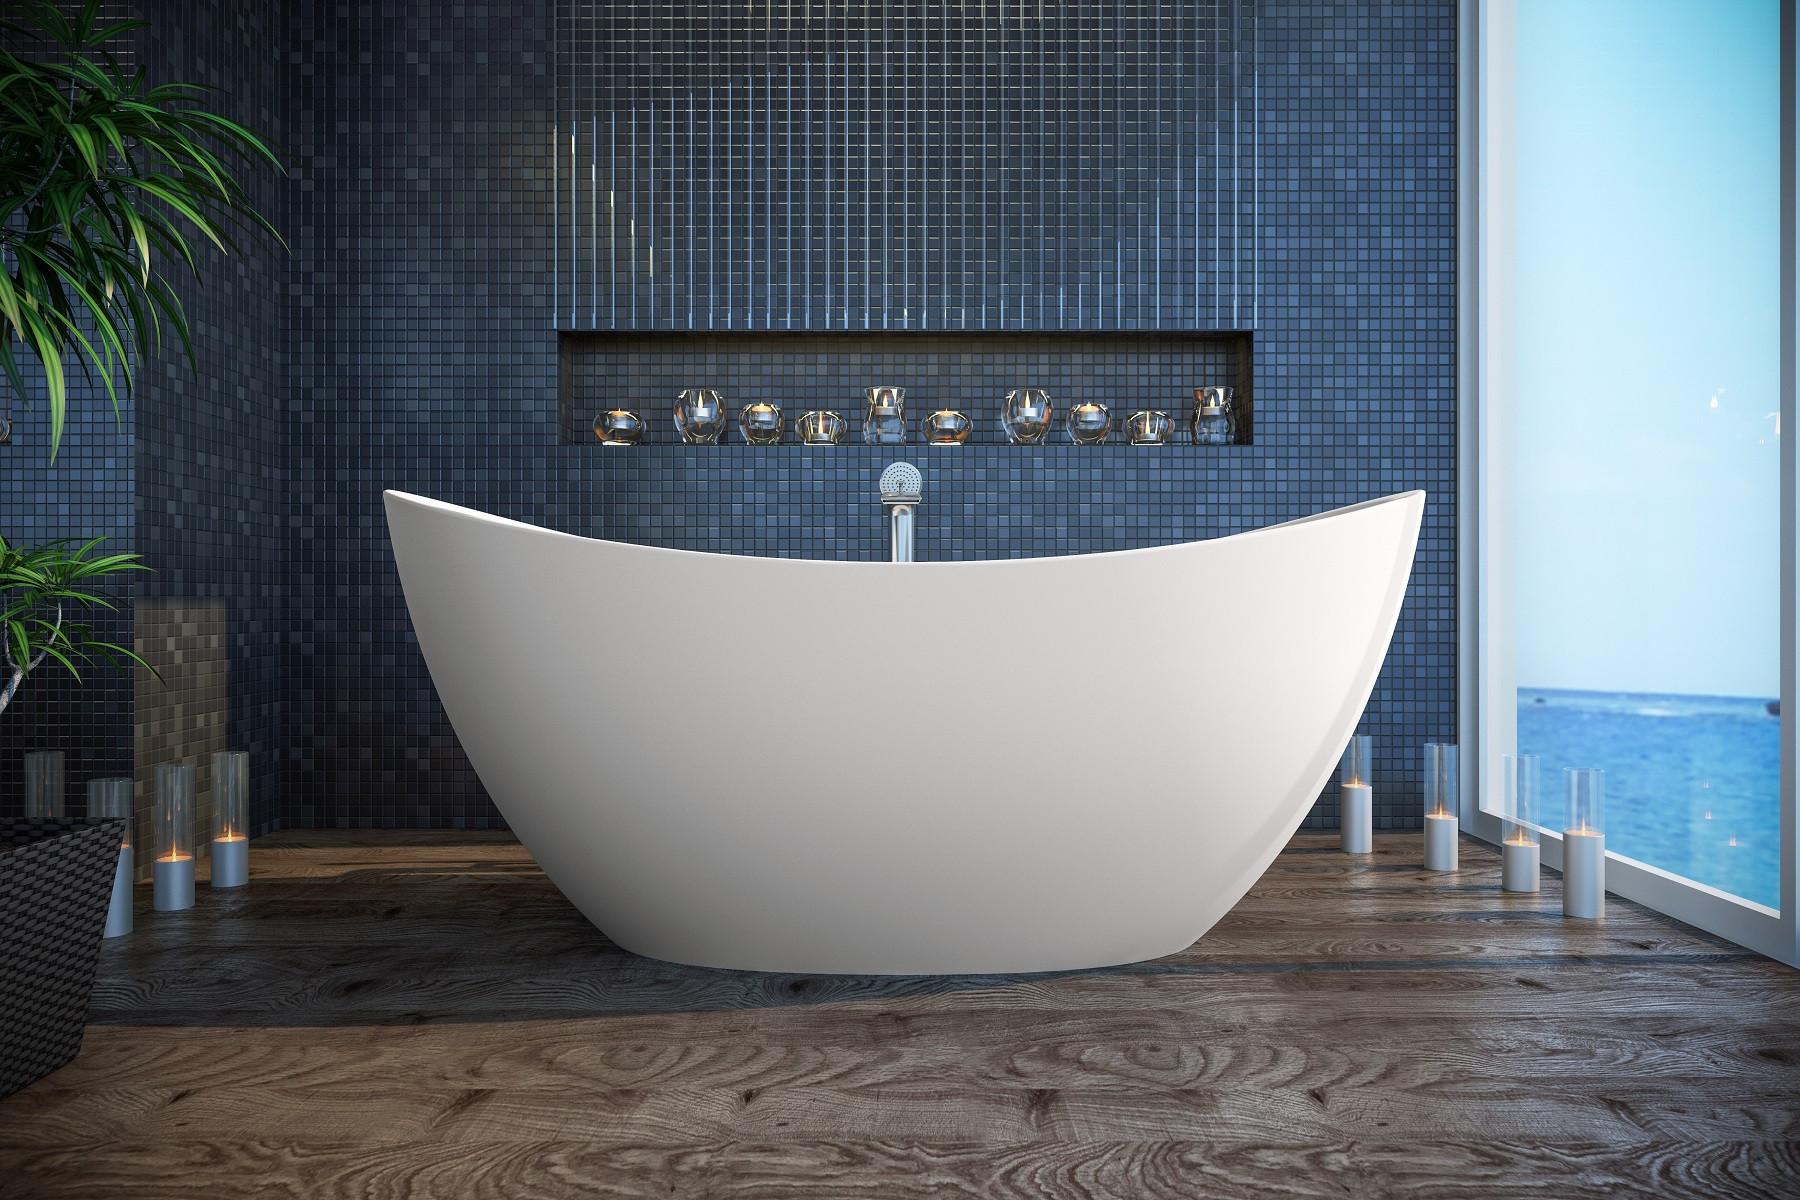 Aquatica PS171M-Wht Purescape 171 Freestanding Solid Surface Bathtub In Matte White